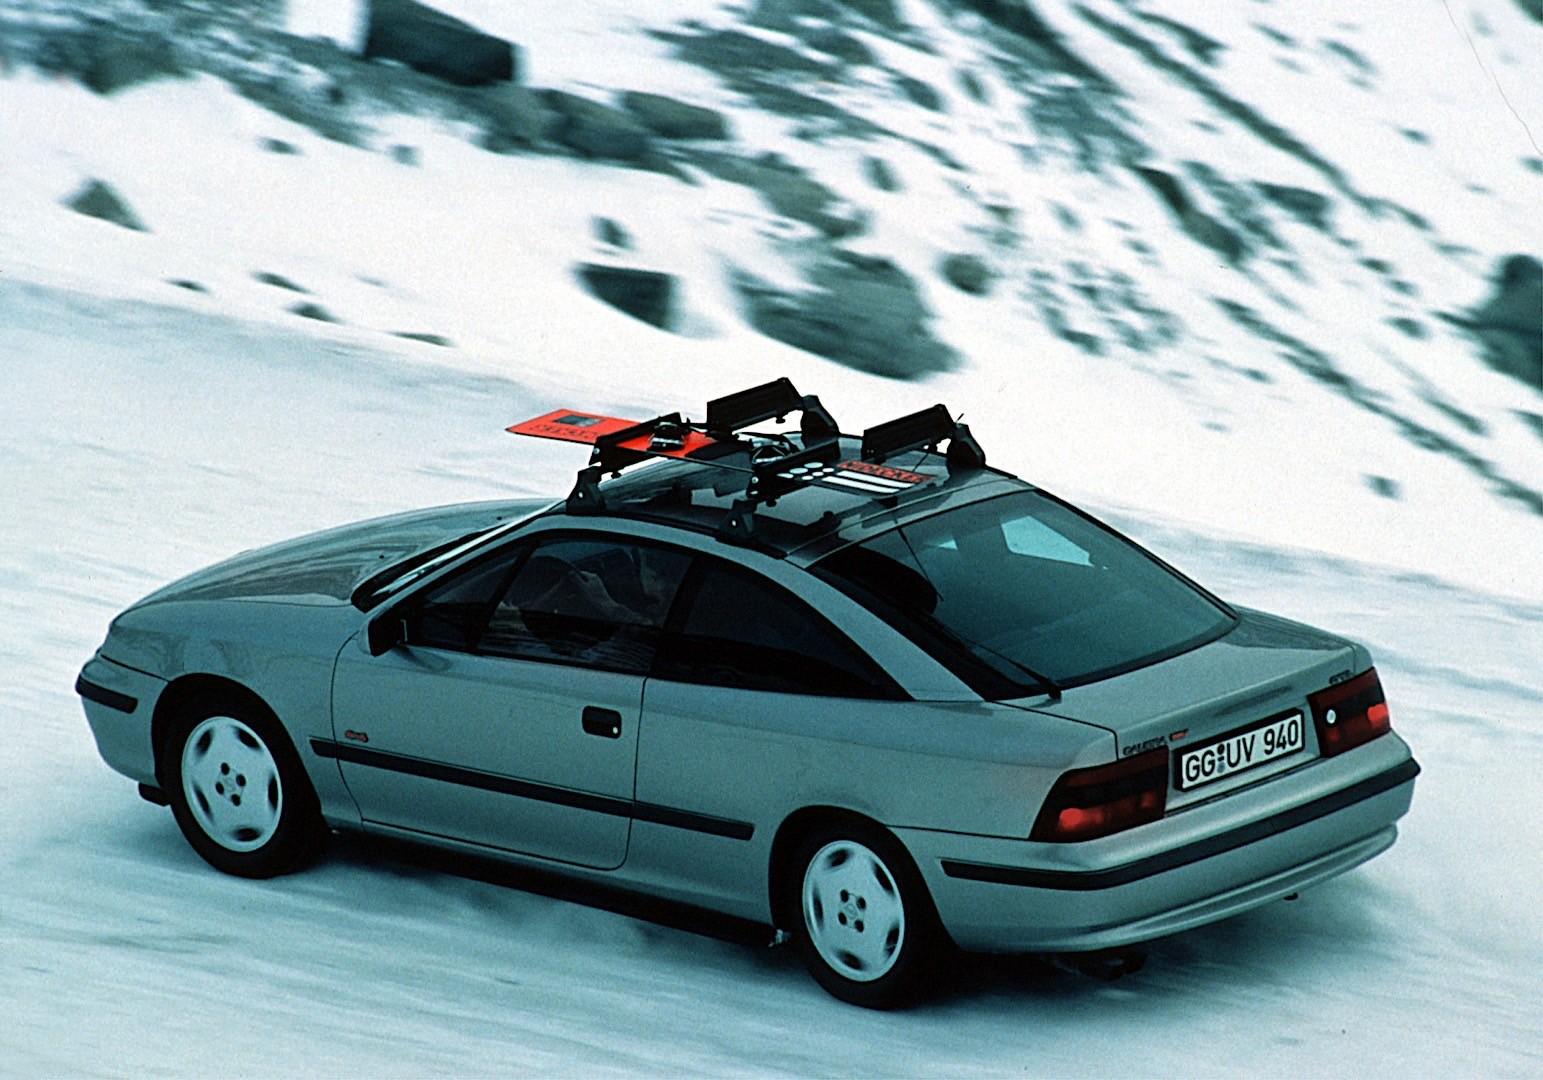 Opel Calibra 1989 - 1997 Coupe #2